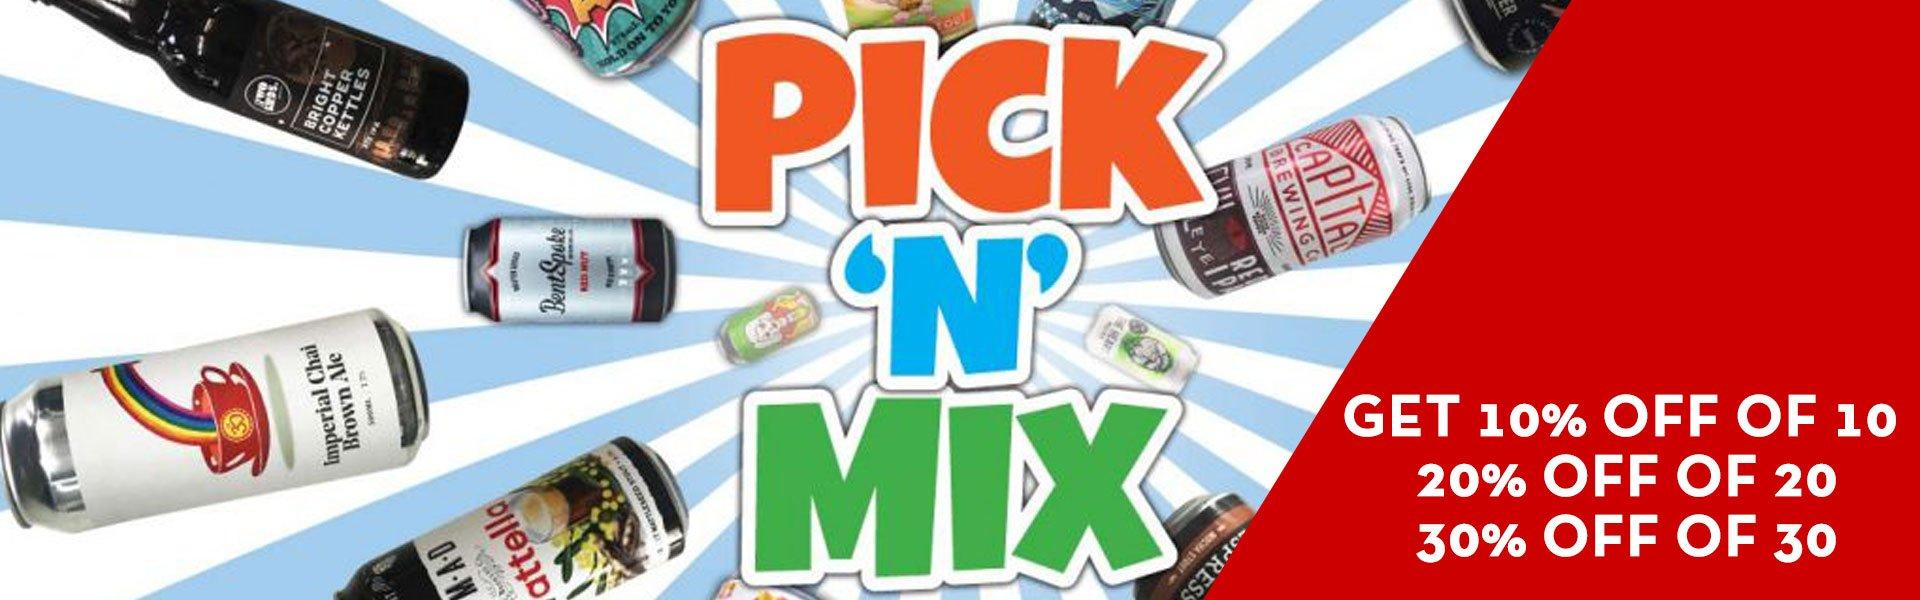 Pick-n-Mix-Banner